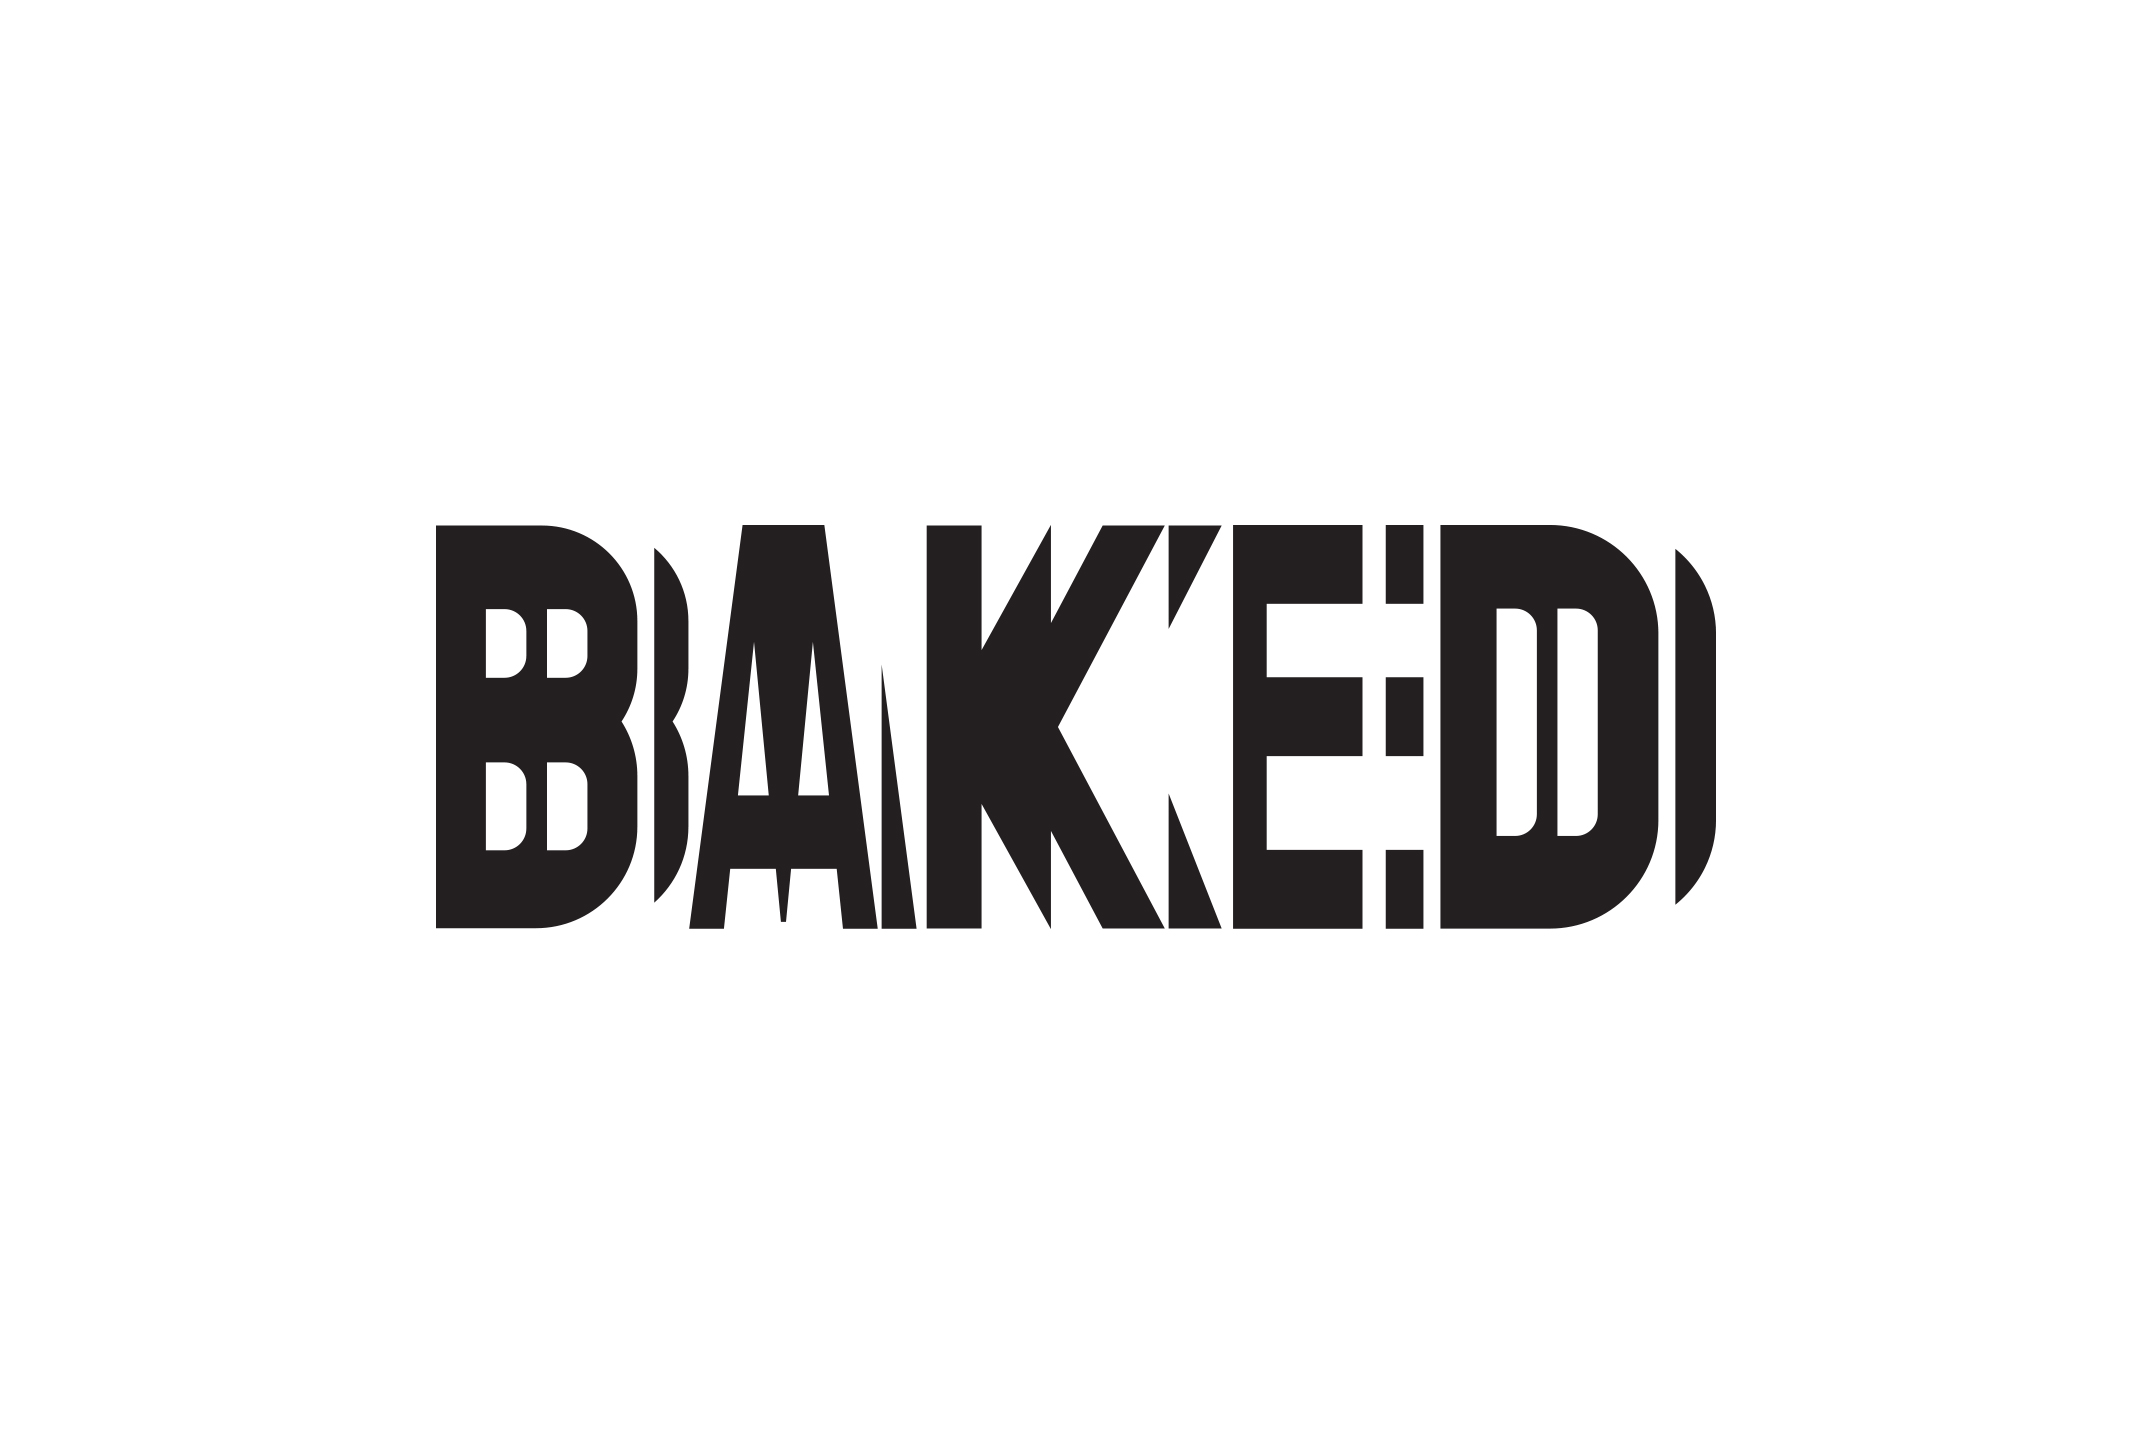 Baked_logo